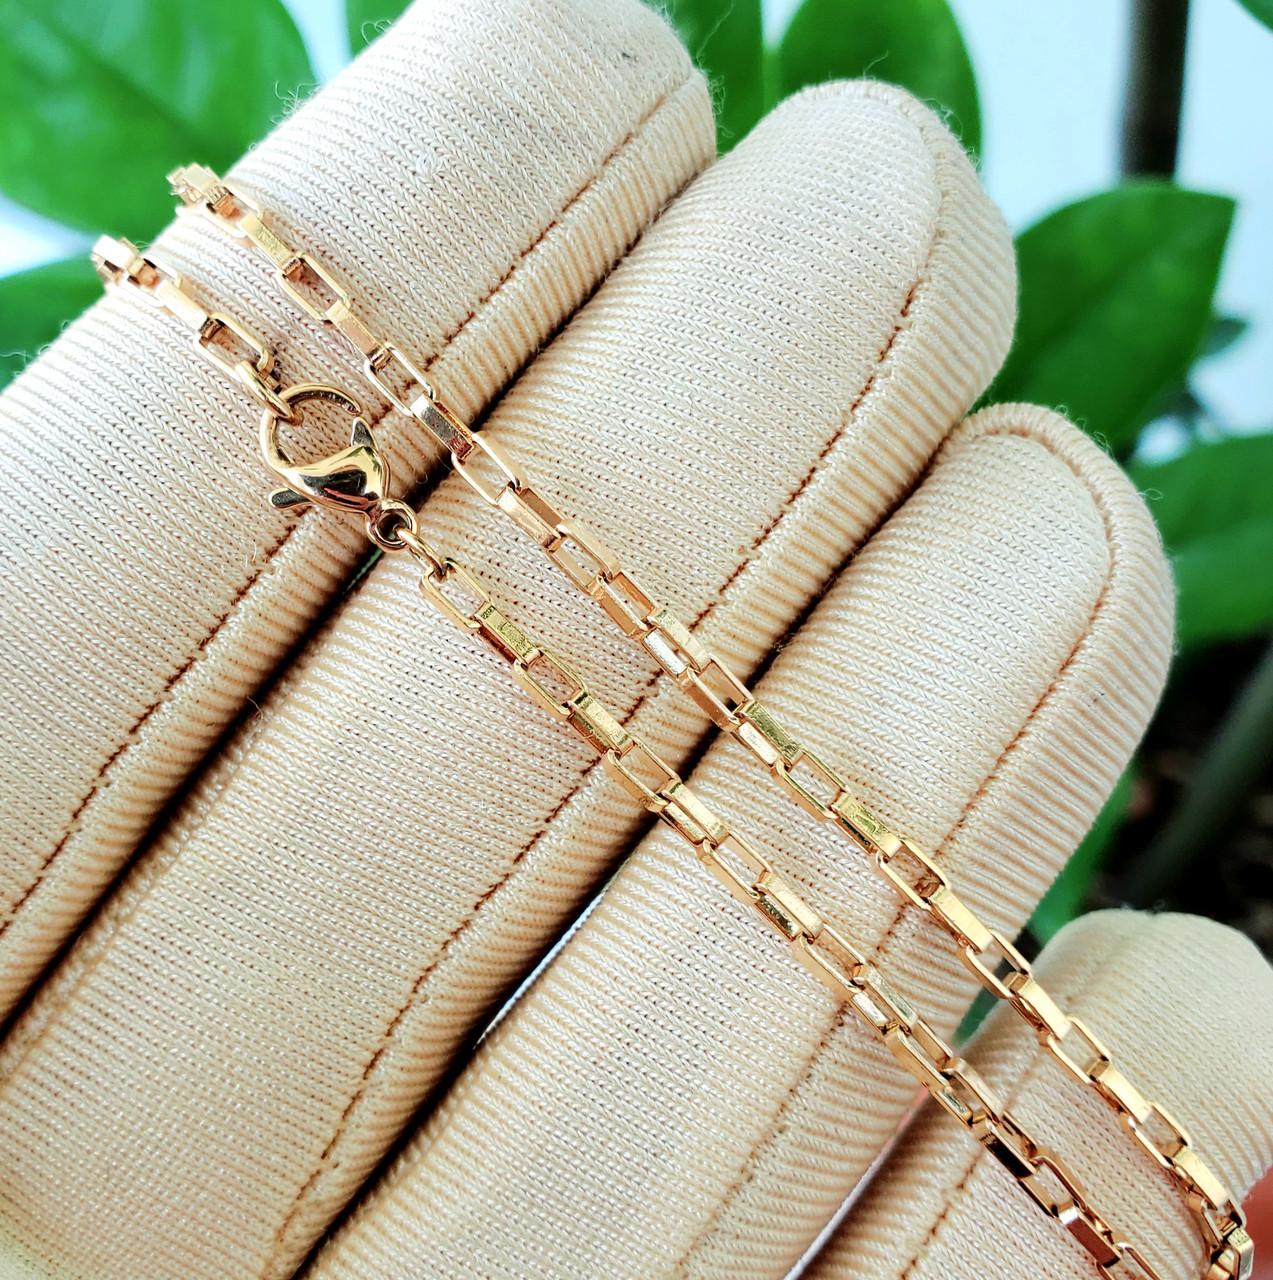 Ланцюжок xuping 2мм 50см медичне золото позолота 18К якірне плетення ц664